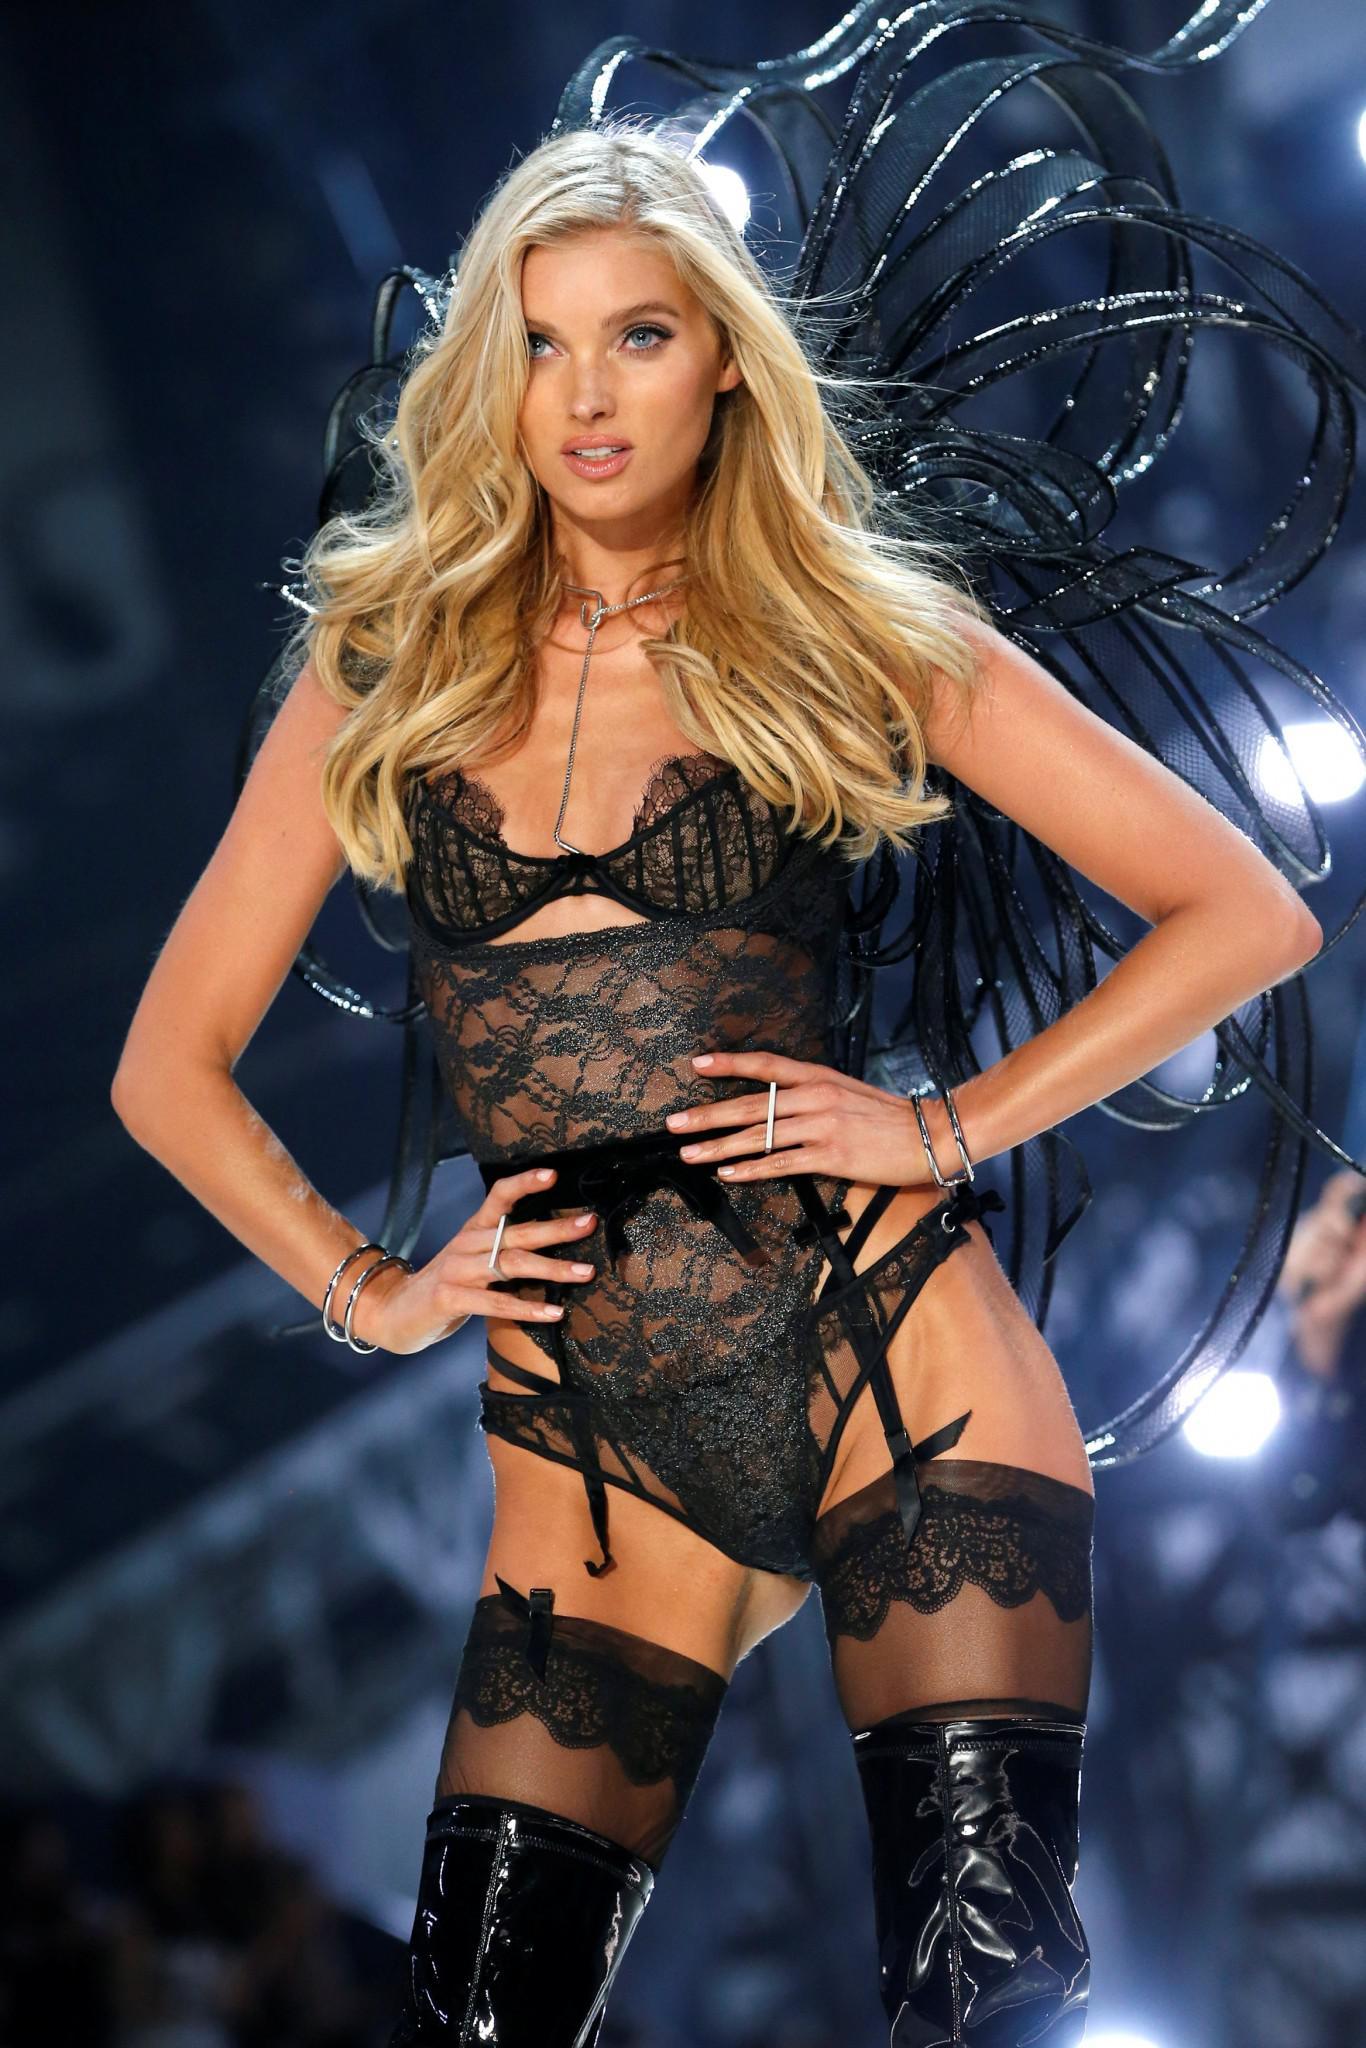 Victoria-Secret-show-esorouxa-modela-1300-1 Το show της Victoria's Secret που «κόλασε» το Παρίσι με τα αγγελάκια της